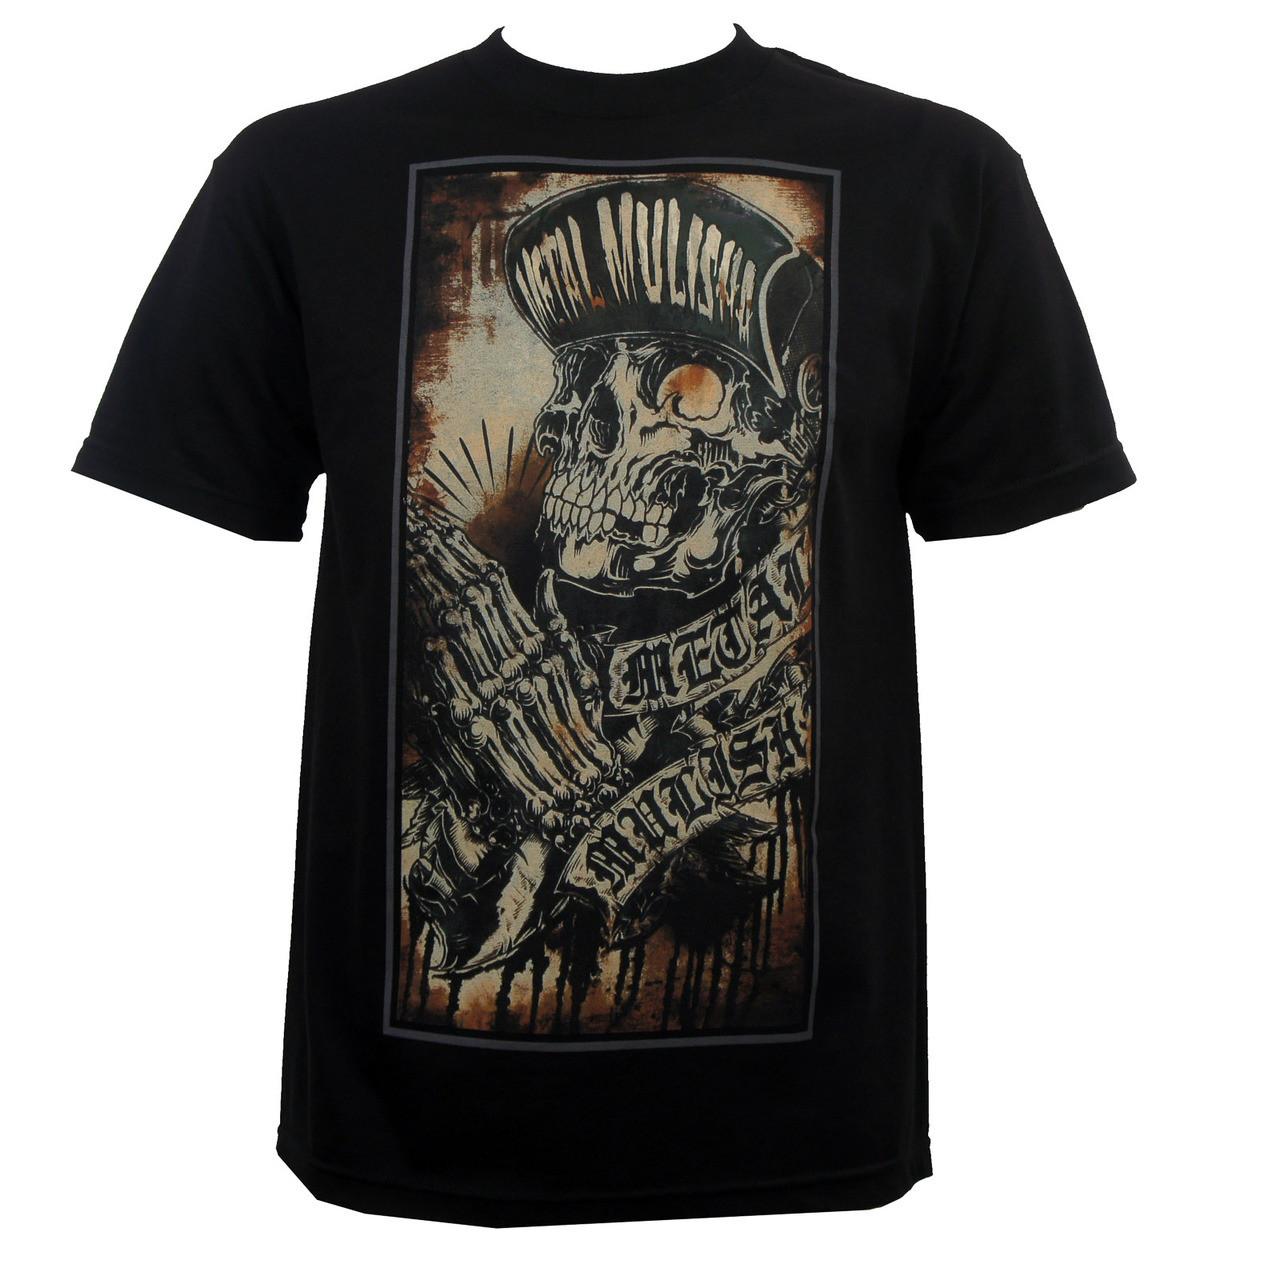 Metal Mulisha Pray T-Shirt Black - Merch2rock Alternative Clothing